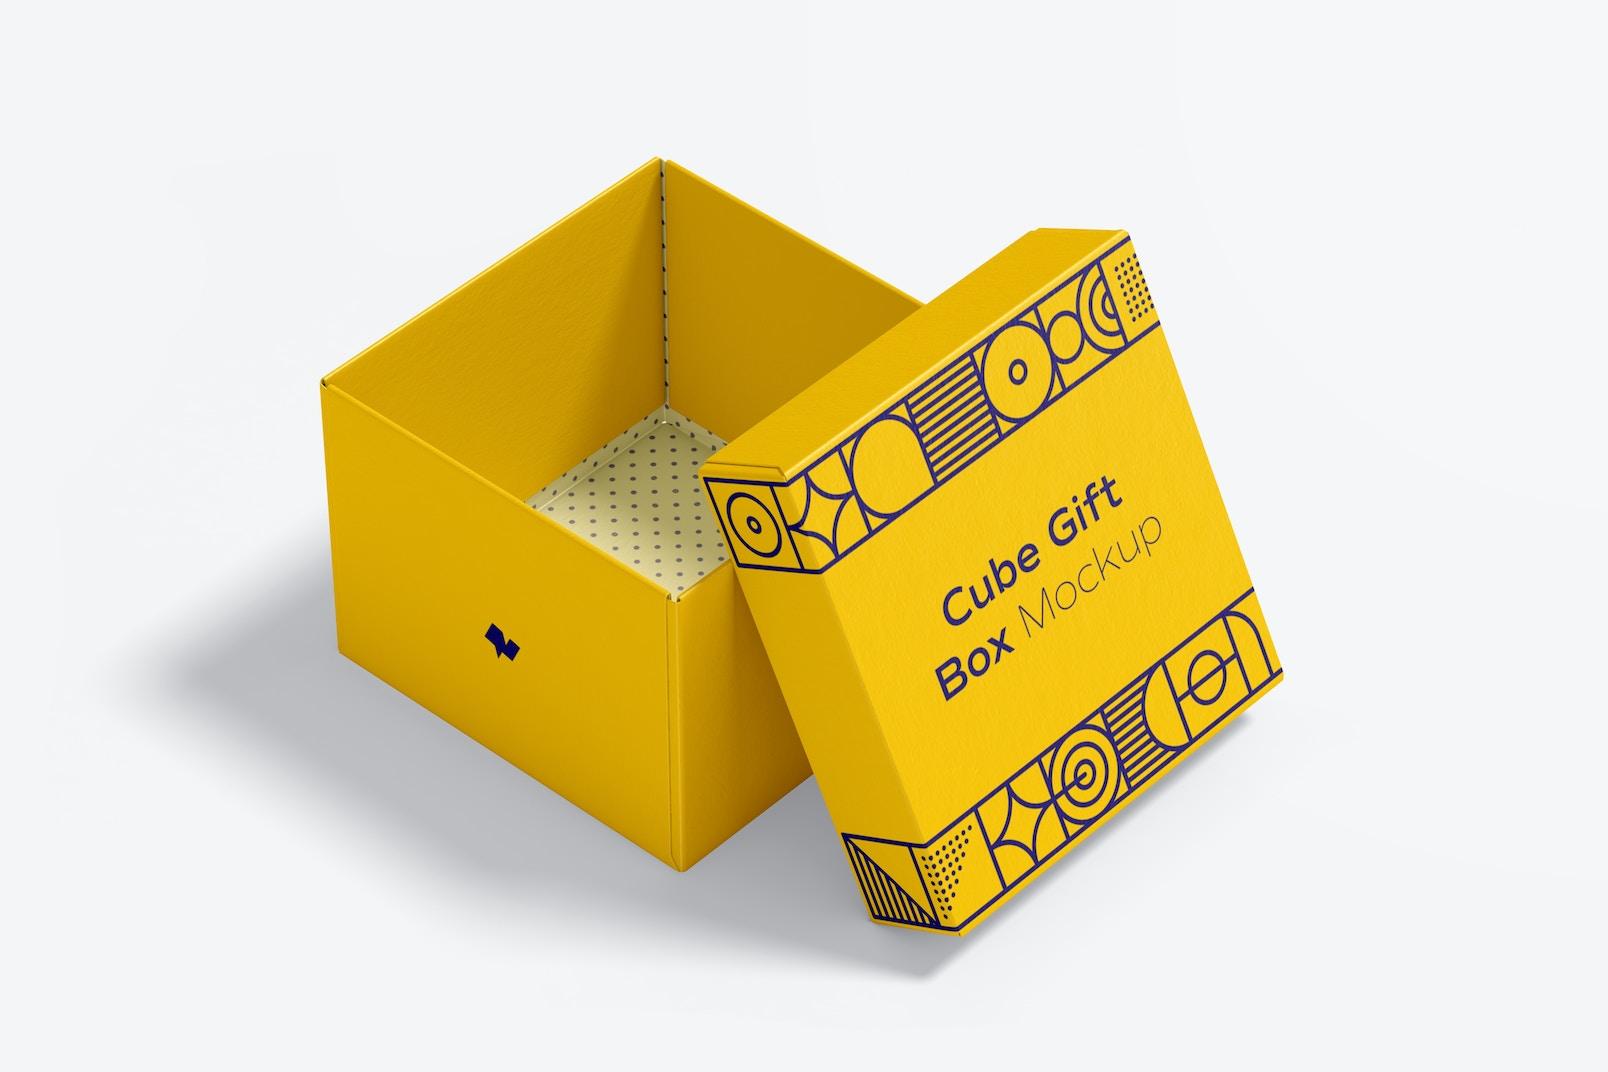 Cube Gift Box Mockup, Open